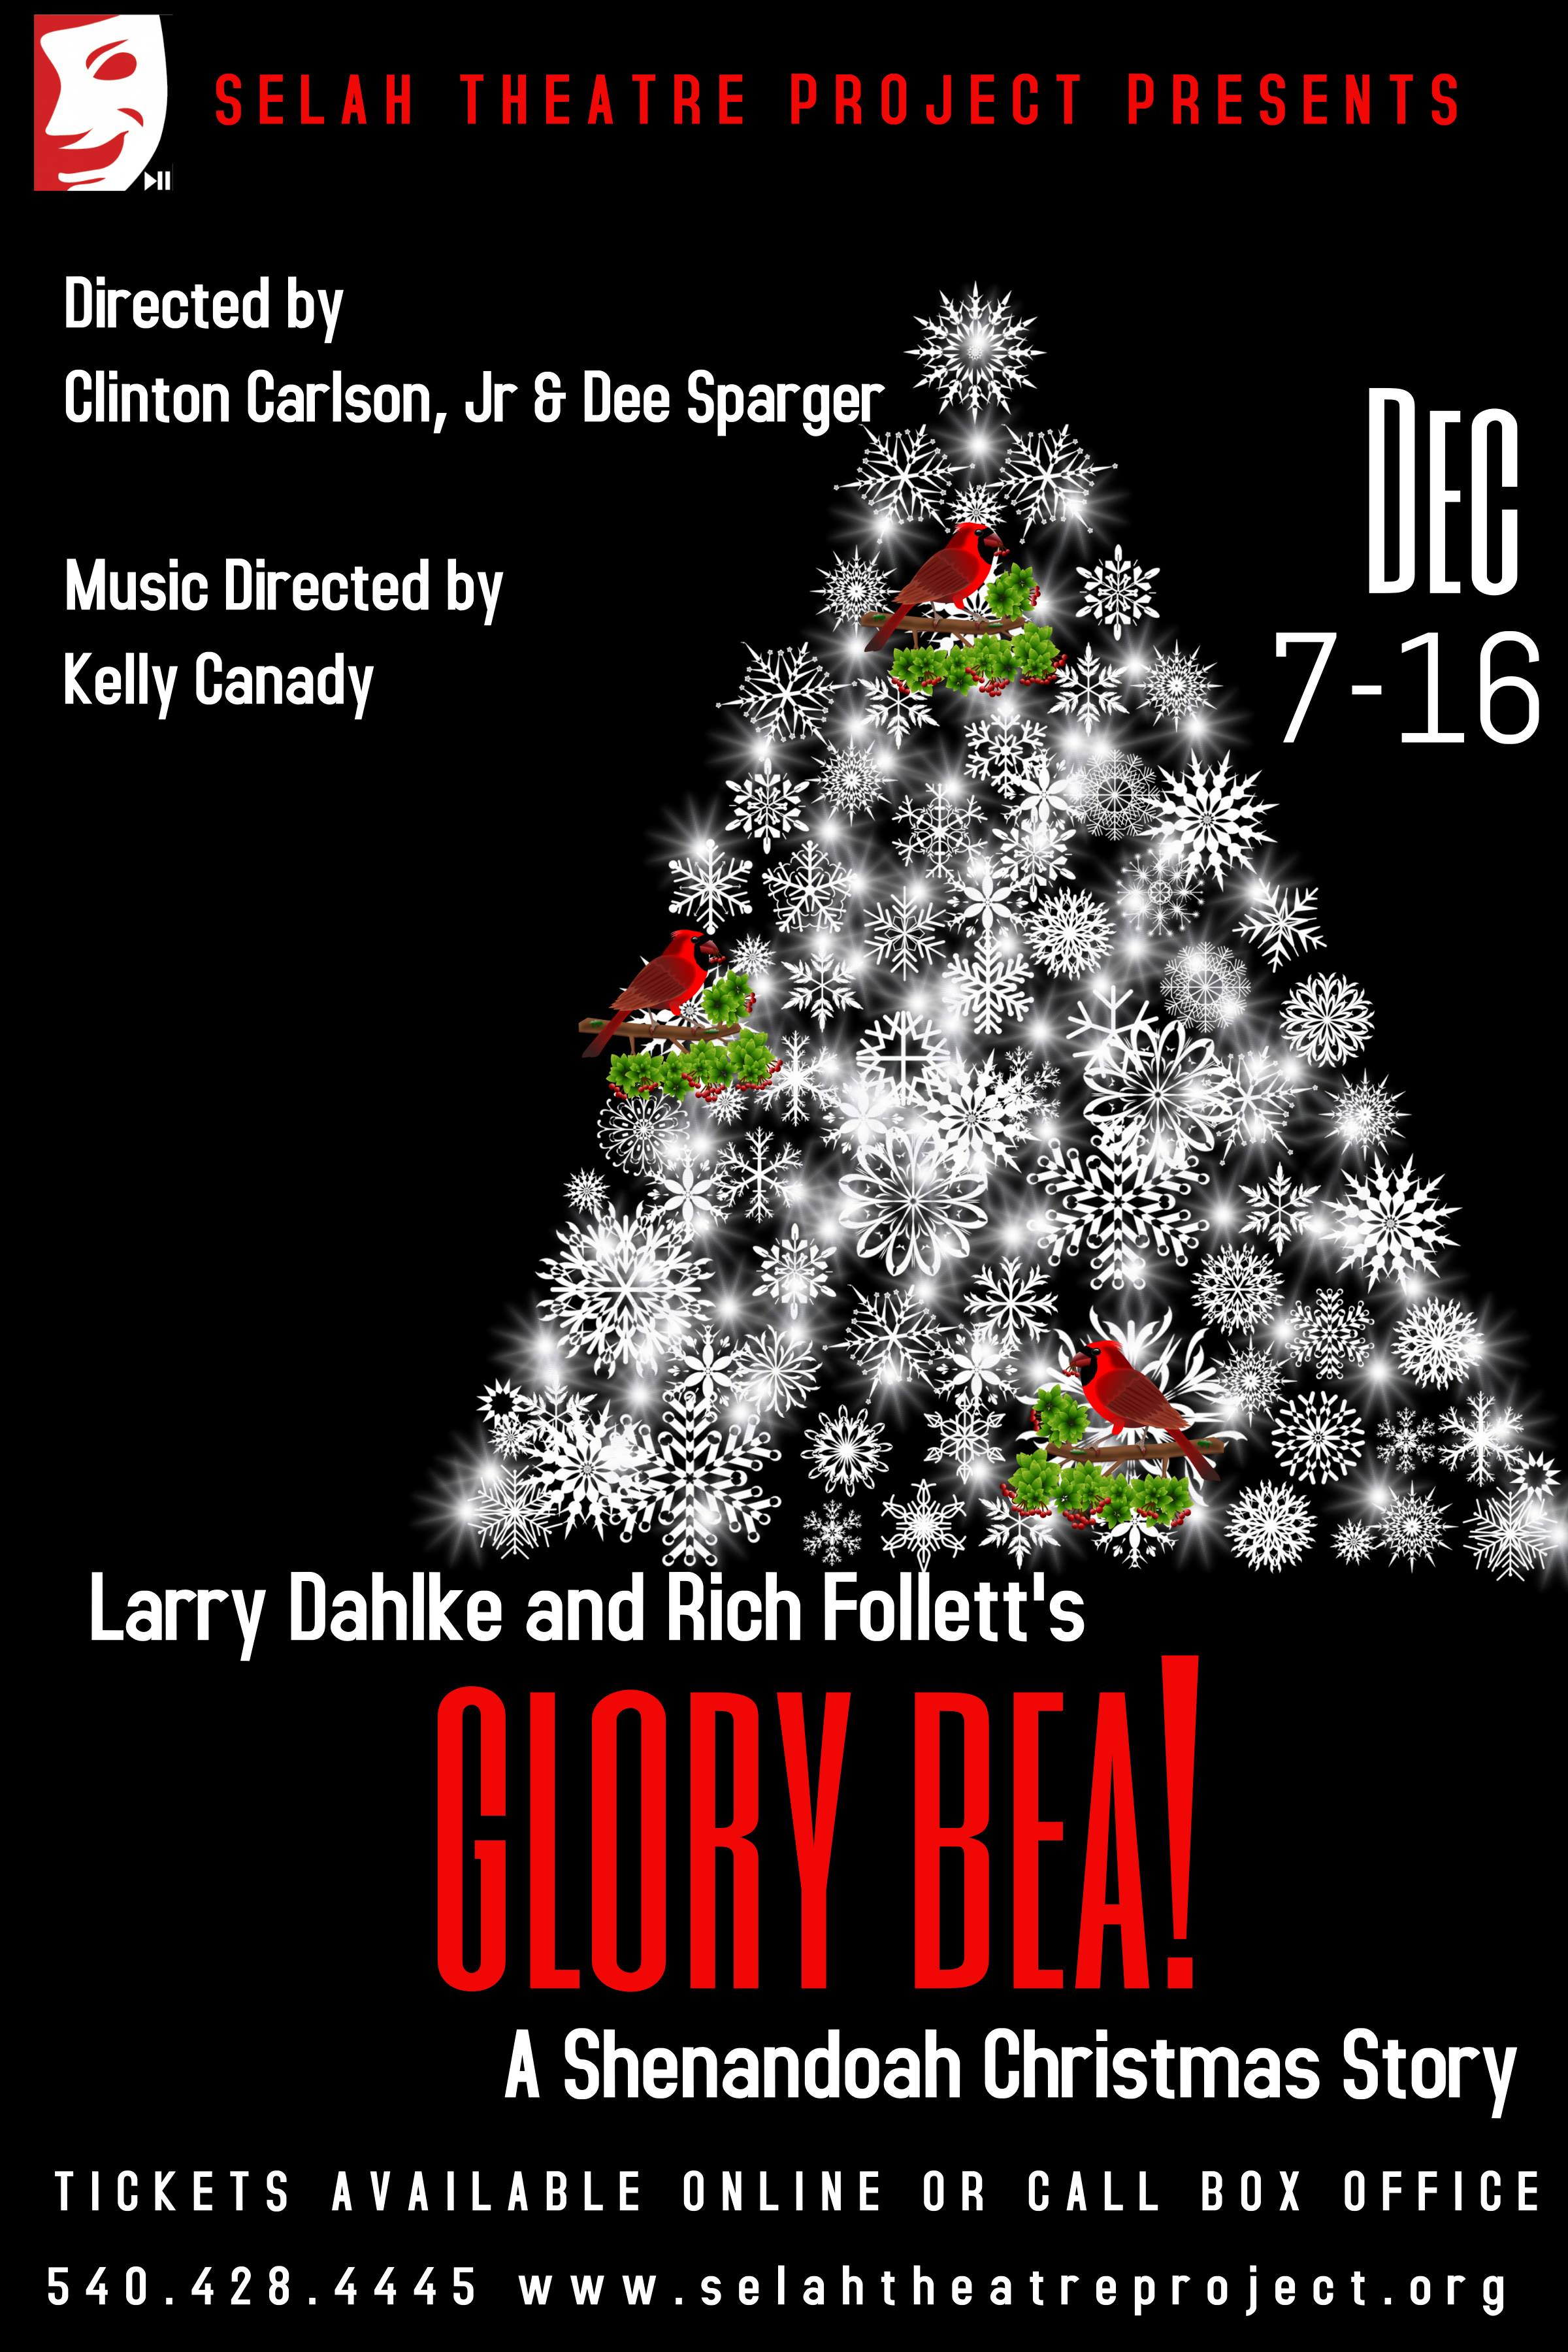 Christmas Story Location.Glory Bea A Shenandoah Christmas Story